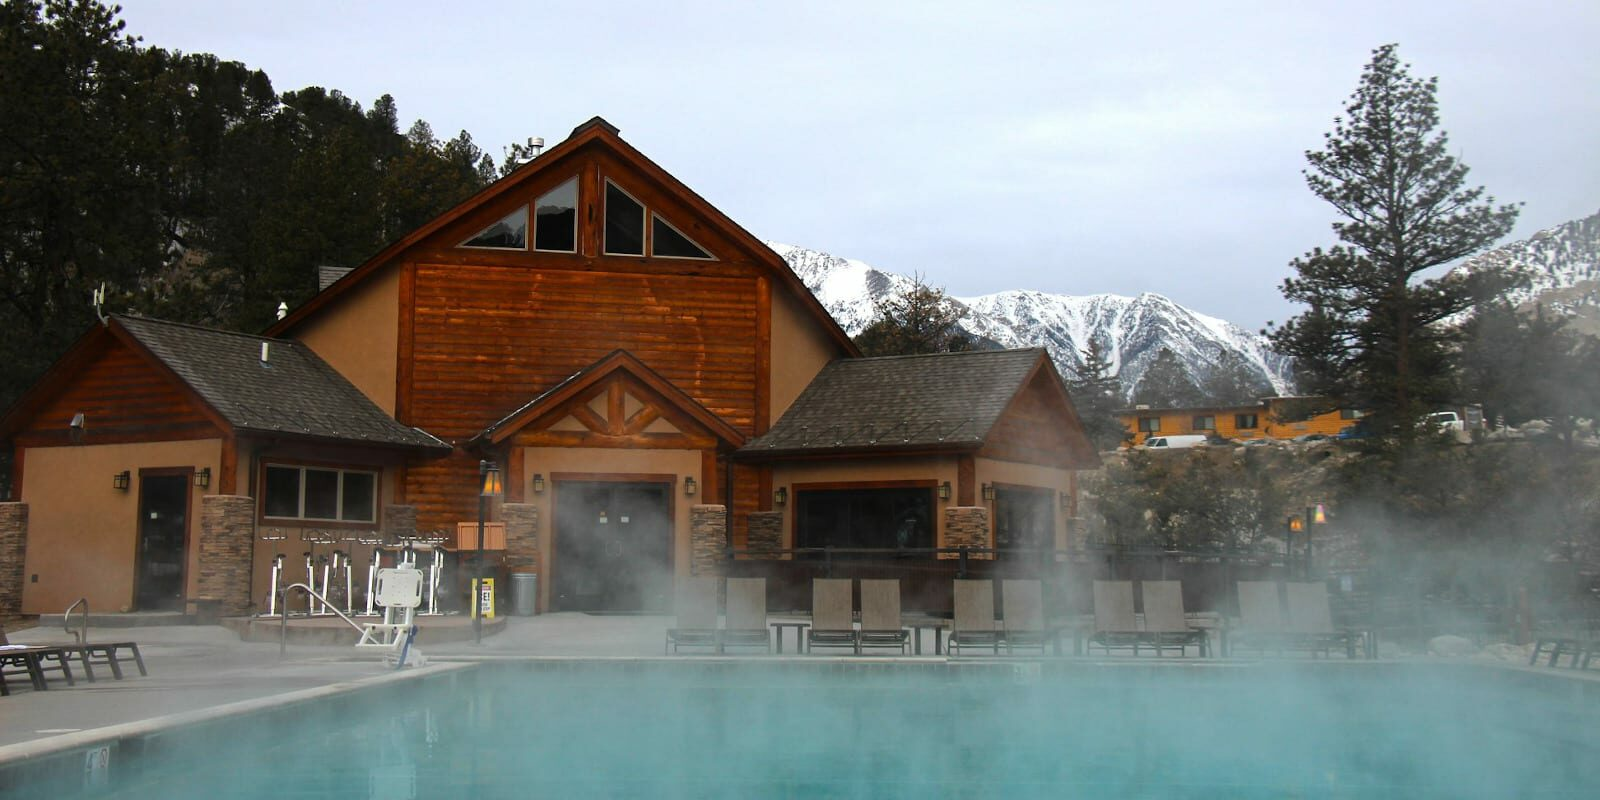 Hot Springs near Buena Vista Mount Princeton Pool